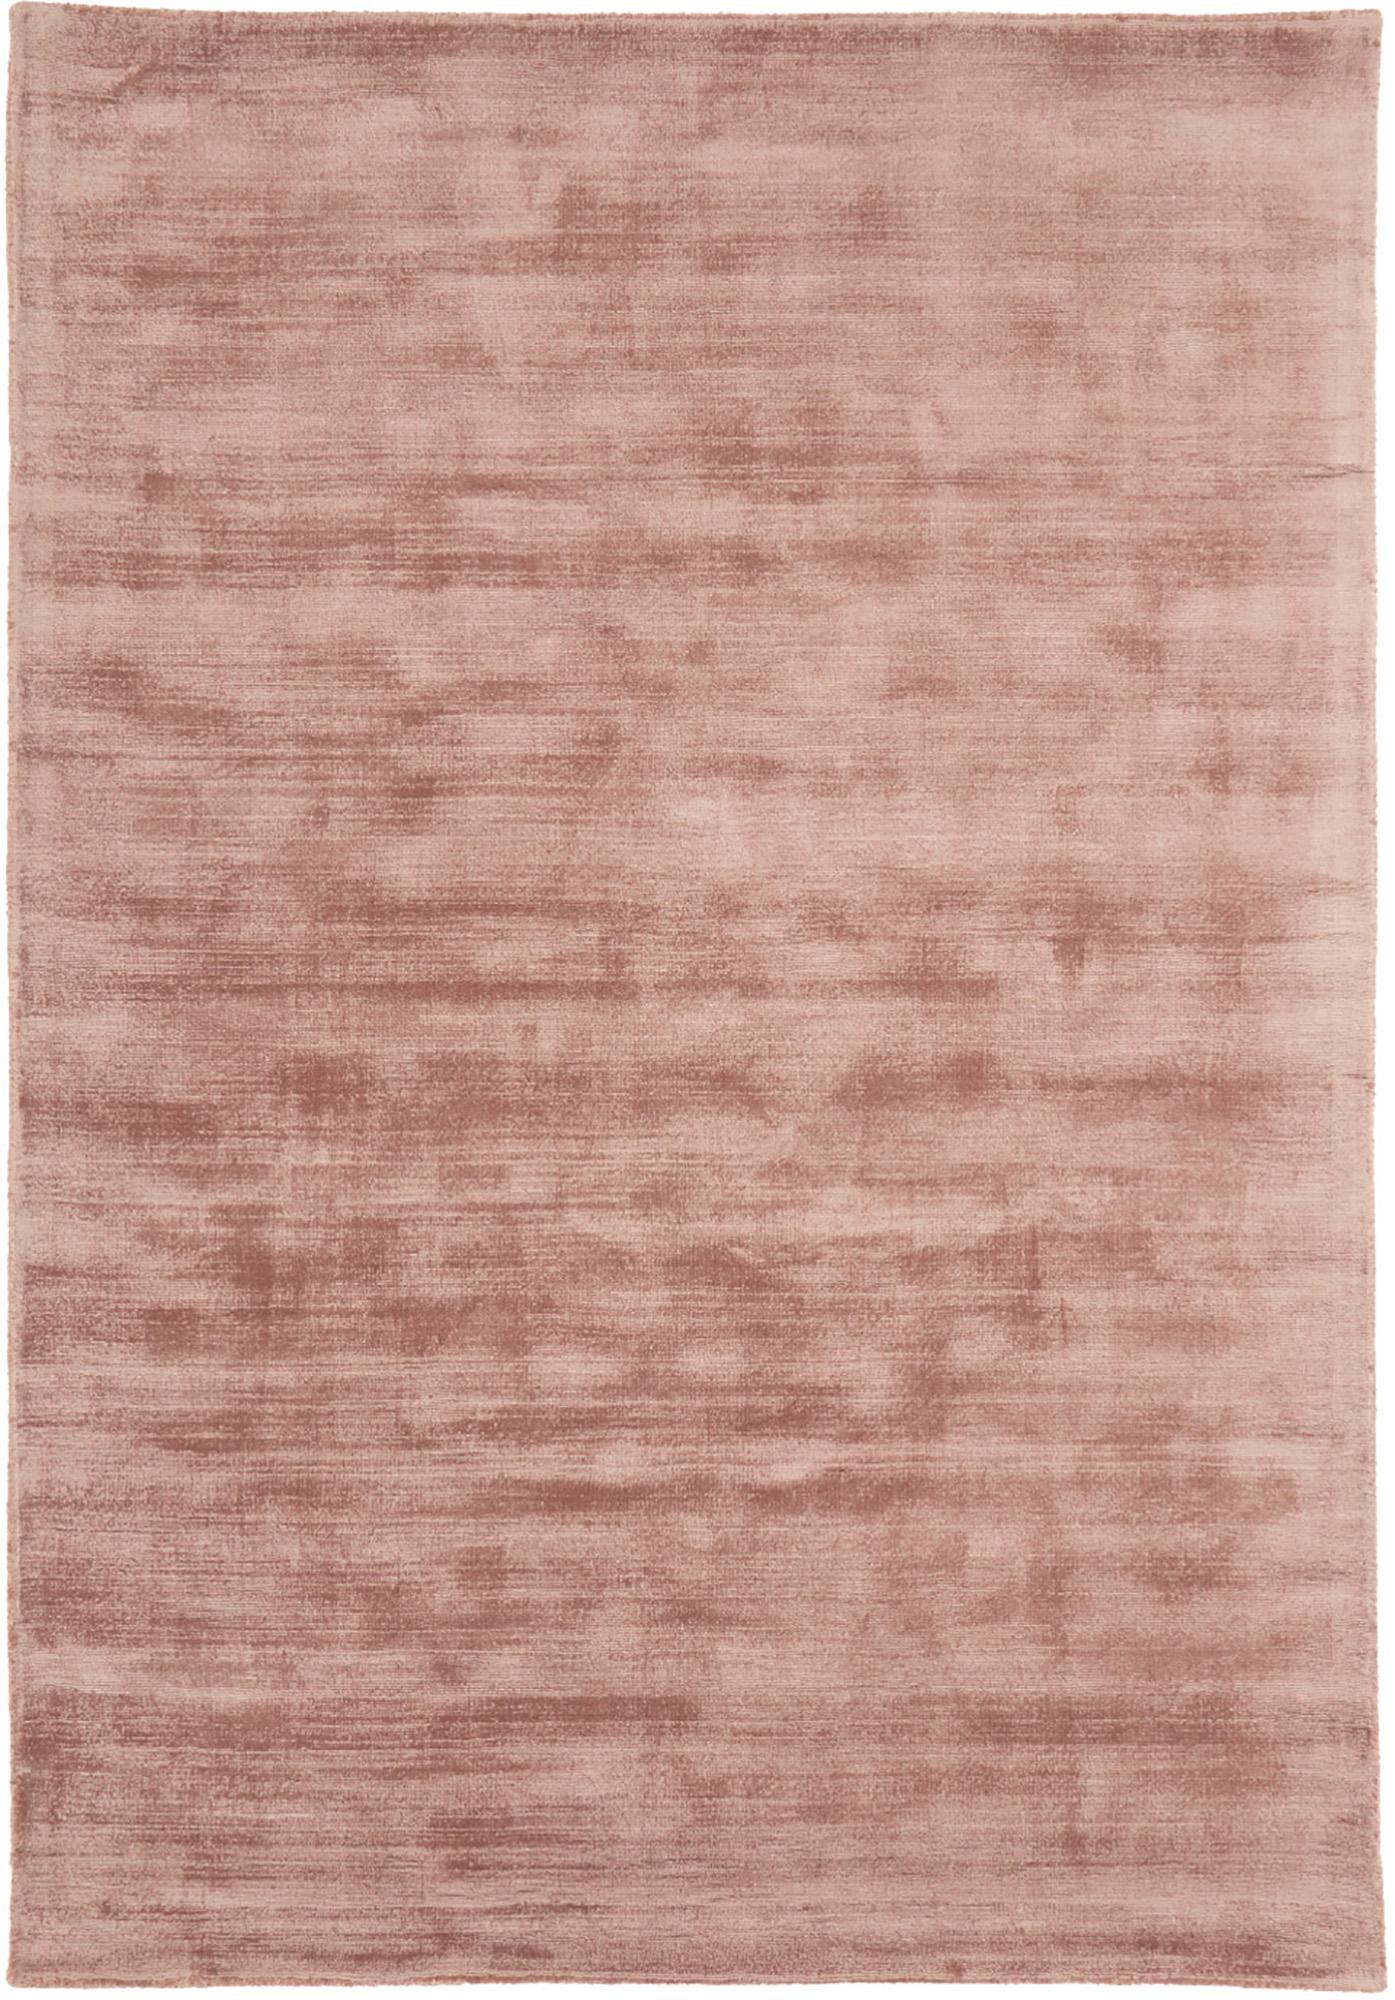 Handgewebter Viskoseteppich Jane in Terrakotta, Flor: 100% Viskose, Terrakotta, B 200 x L 300 cm (Größe L)